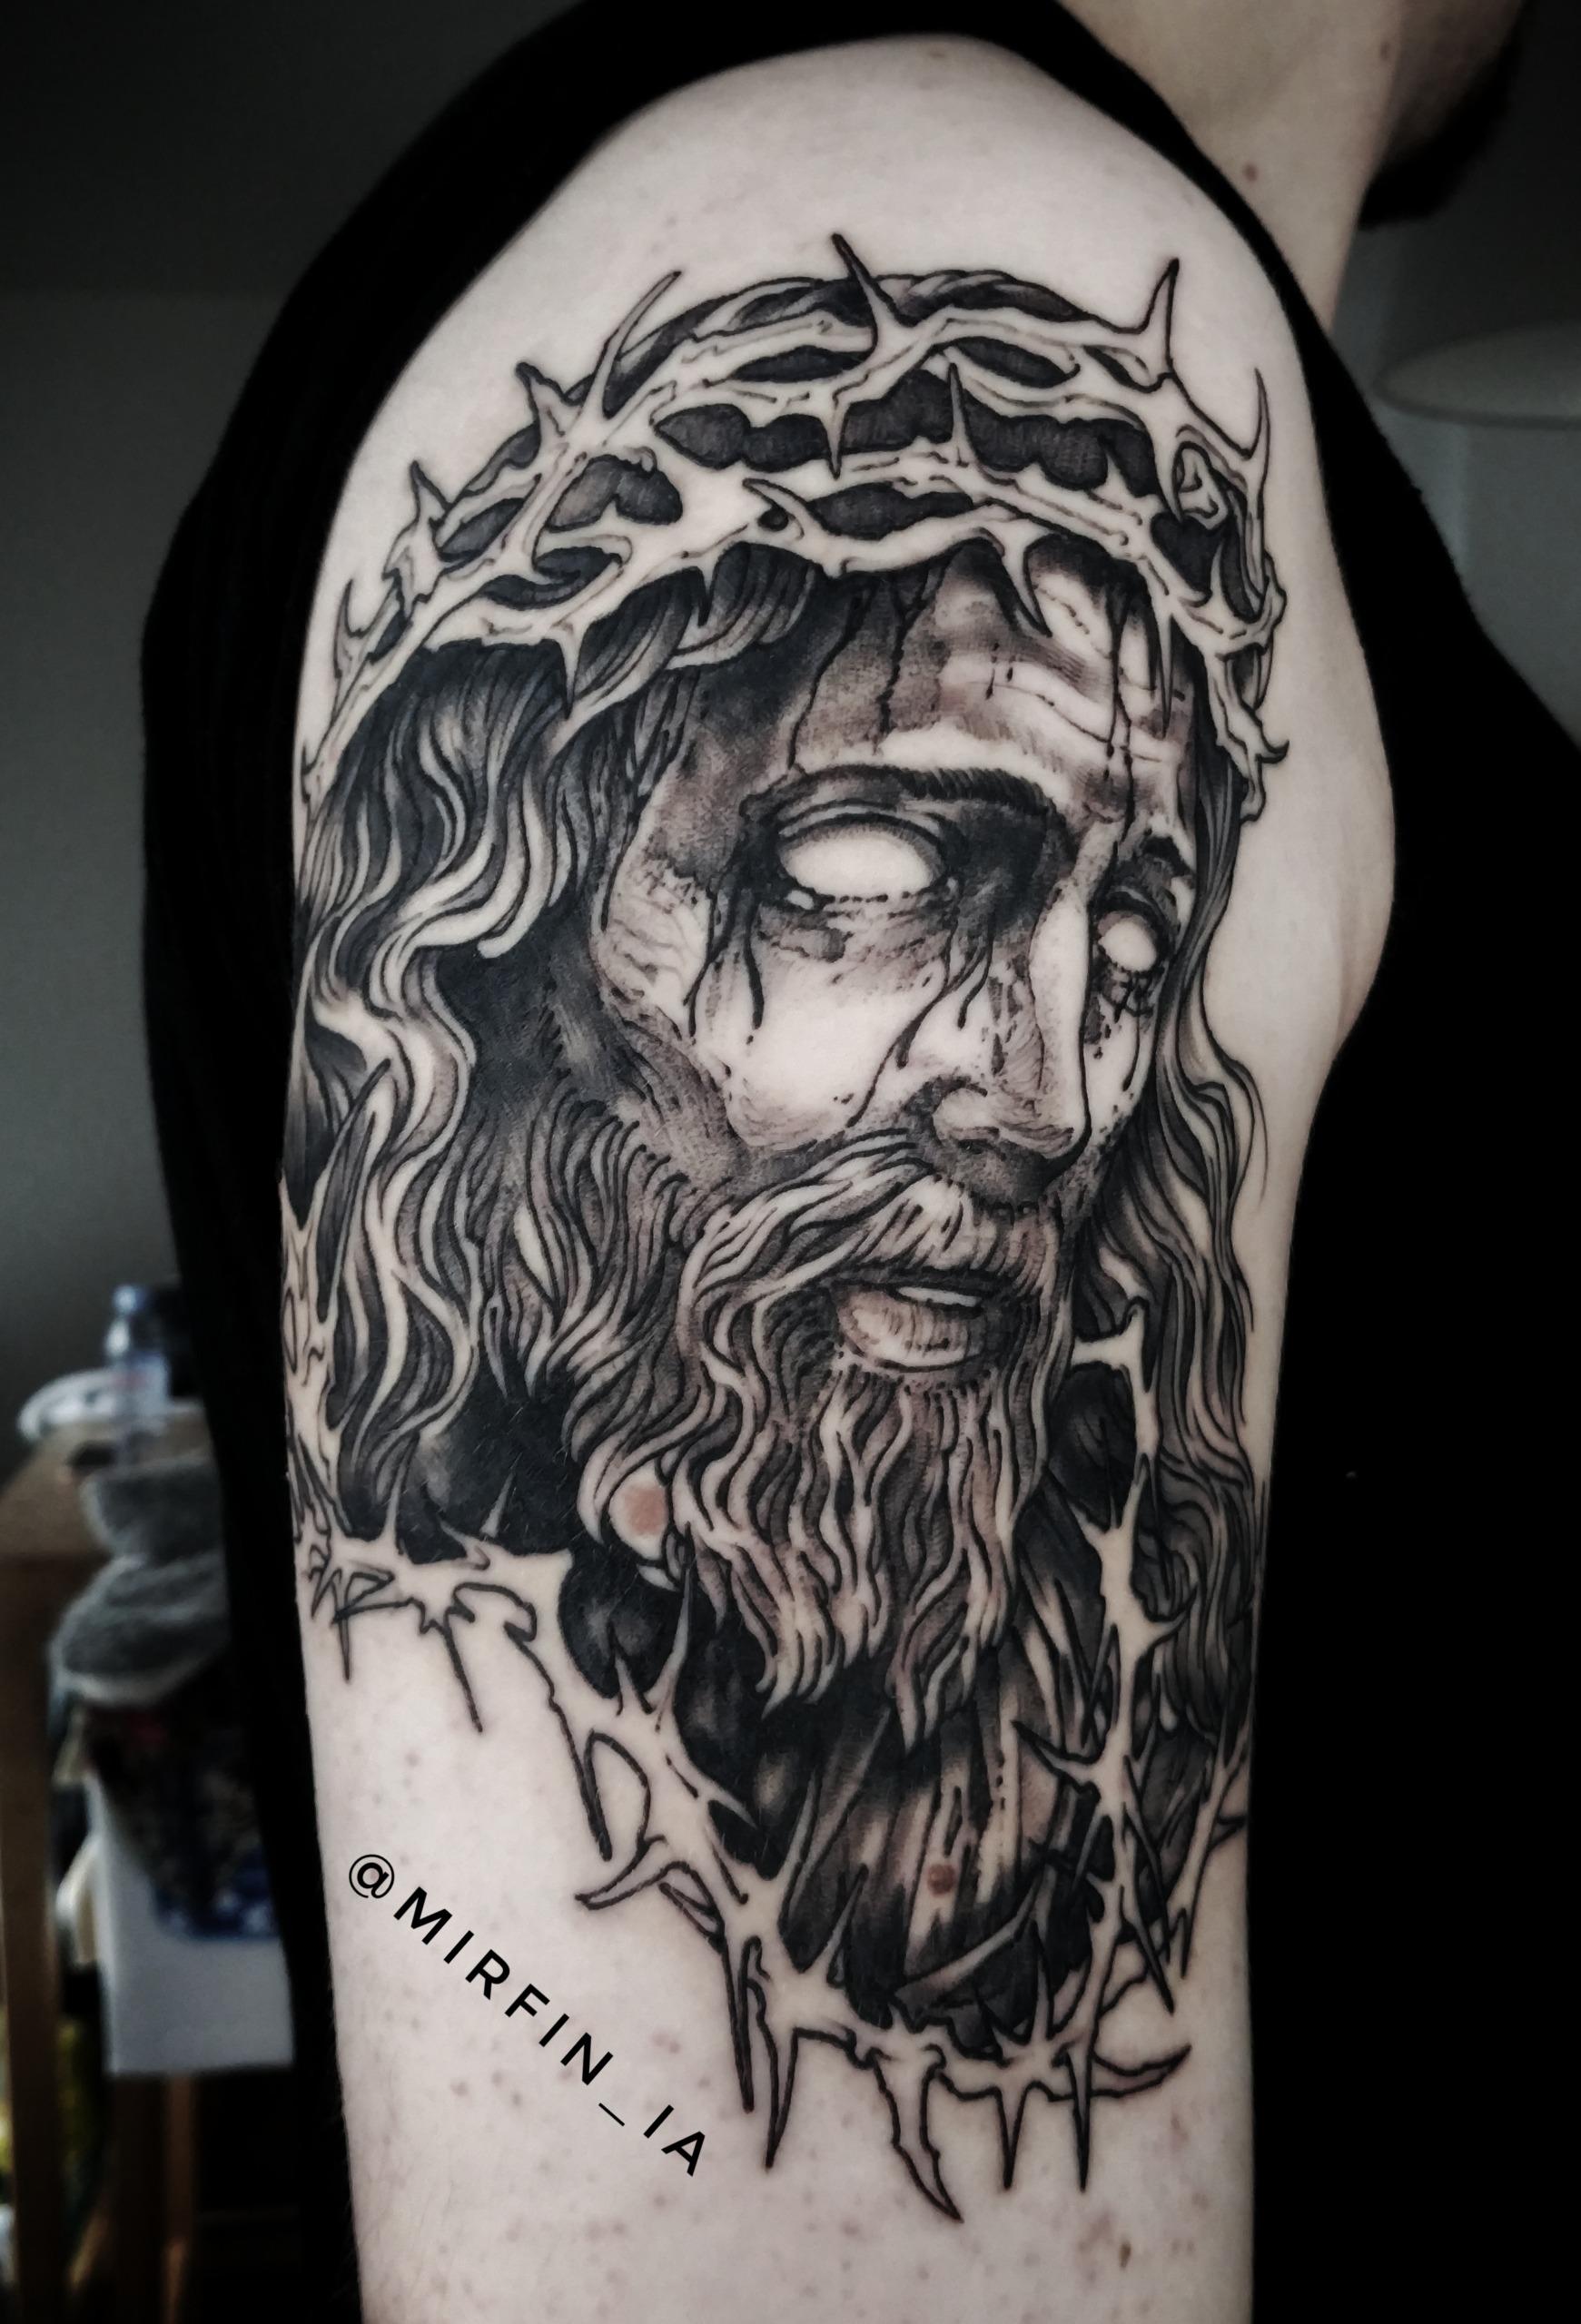 Accueil 681 Tattoos Salon De Tatouages A Lyon